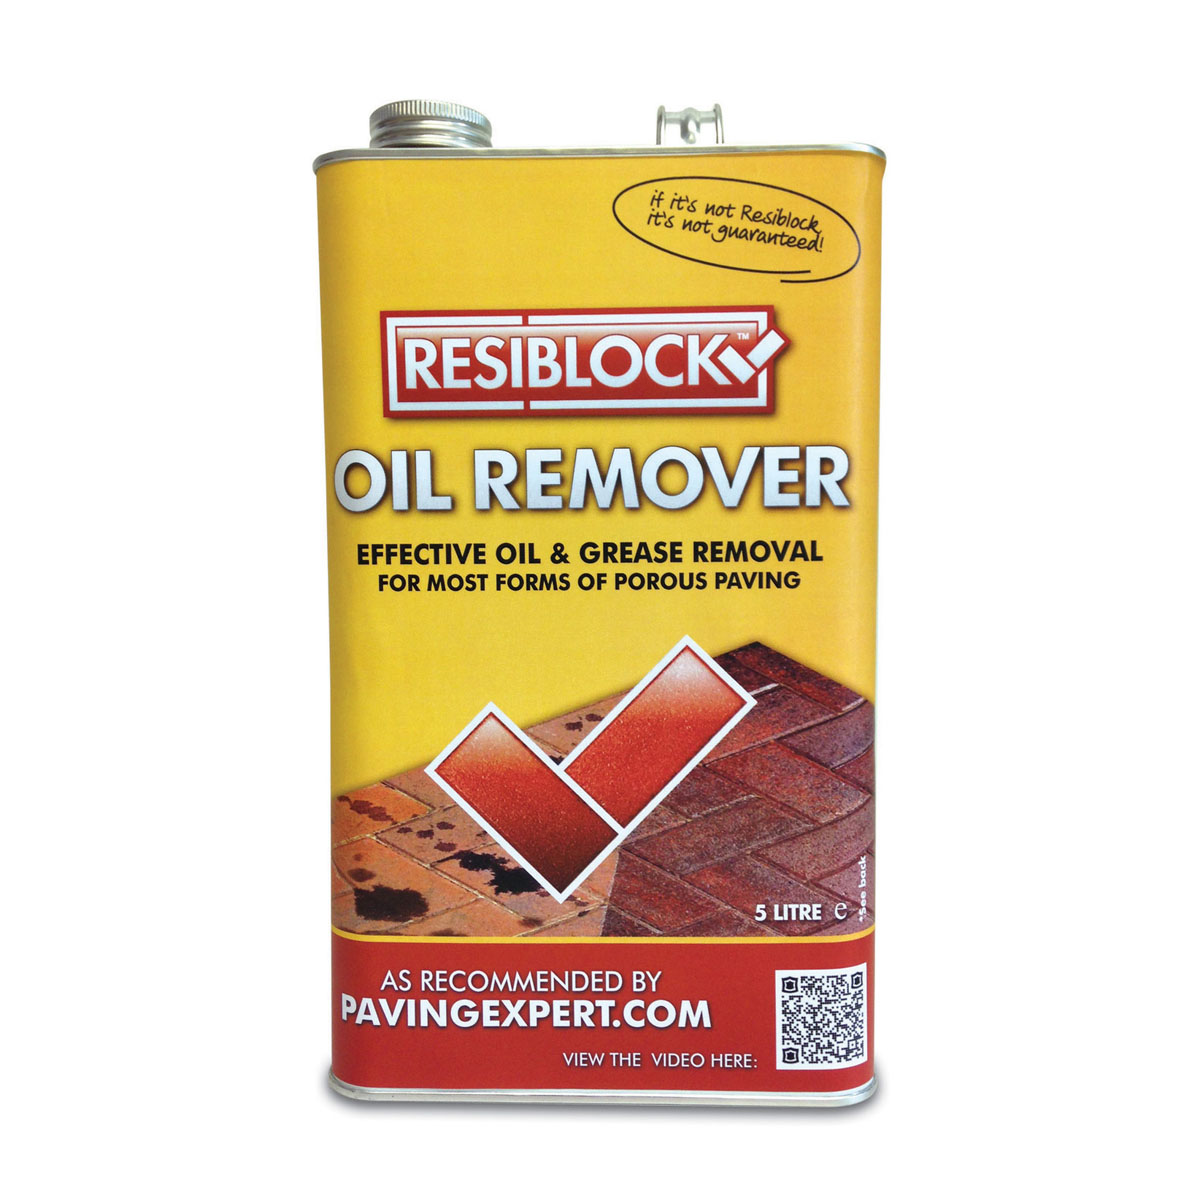 Resiblock Oil Remover